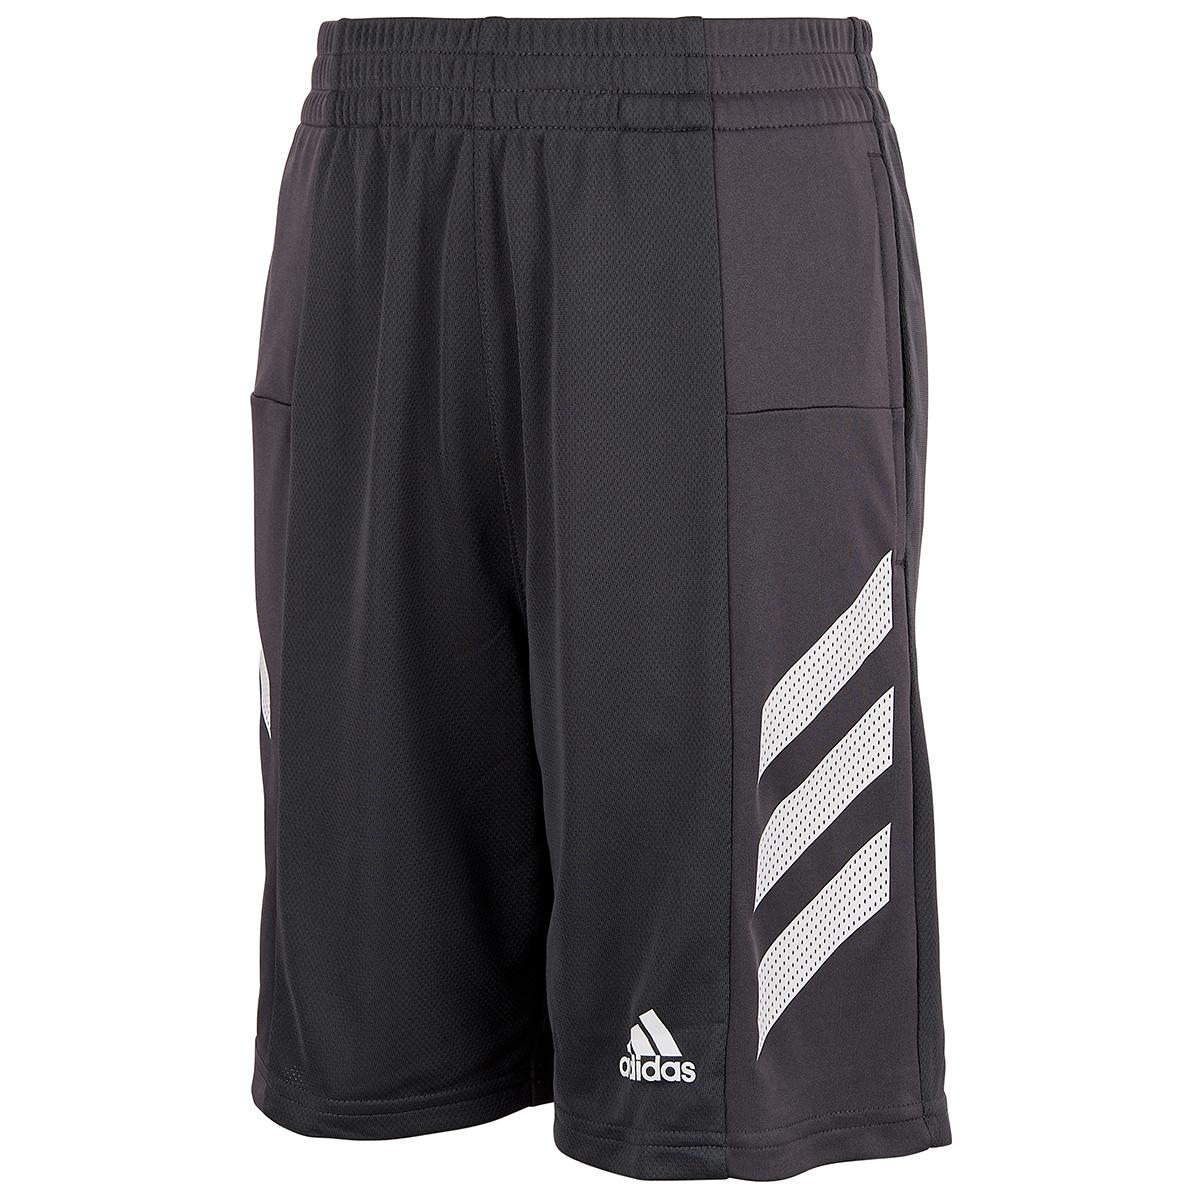 Adidas Boys' Pro Sport 3-Stripe Shorts - Black, XL